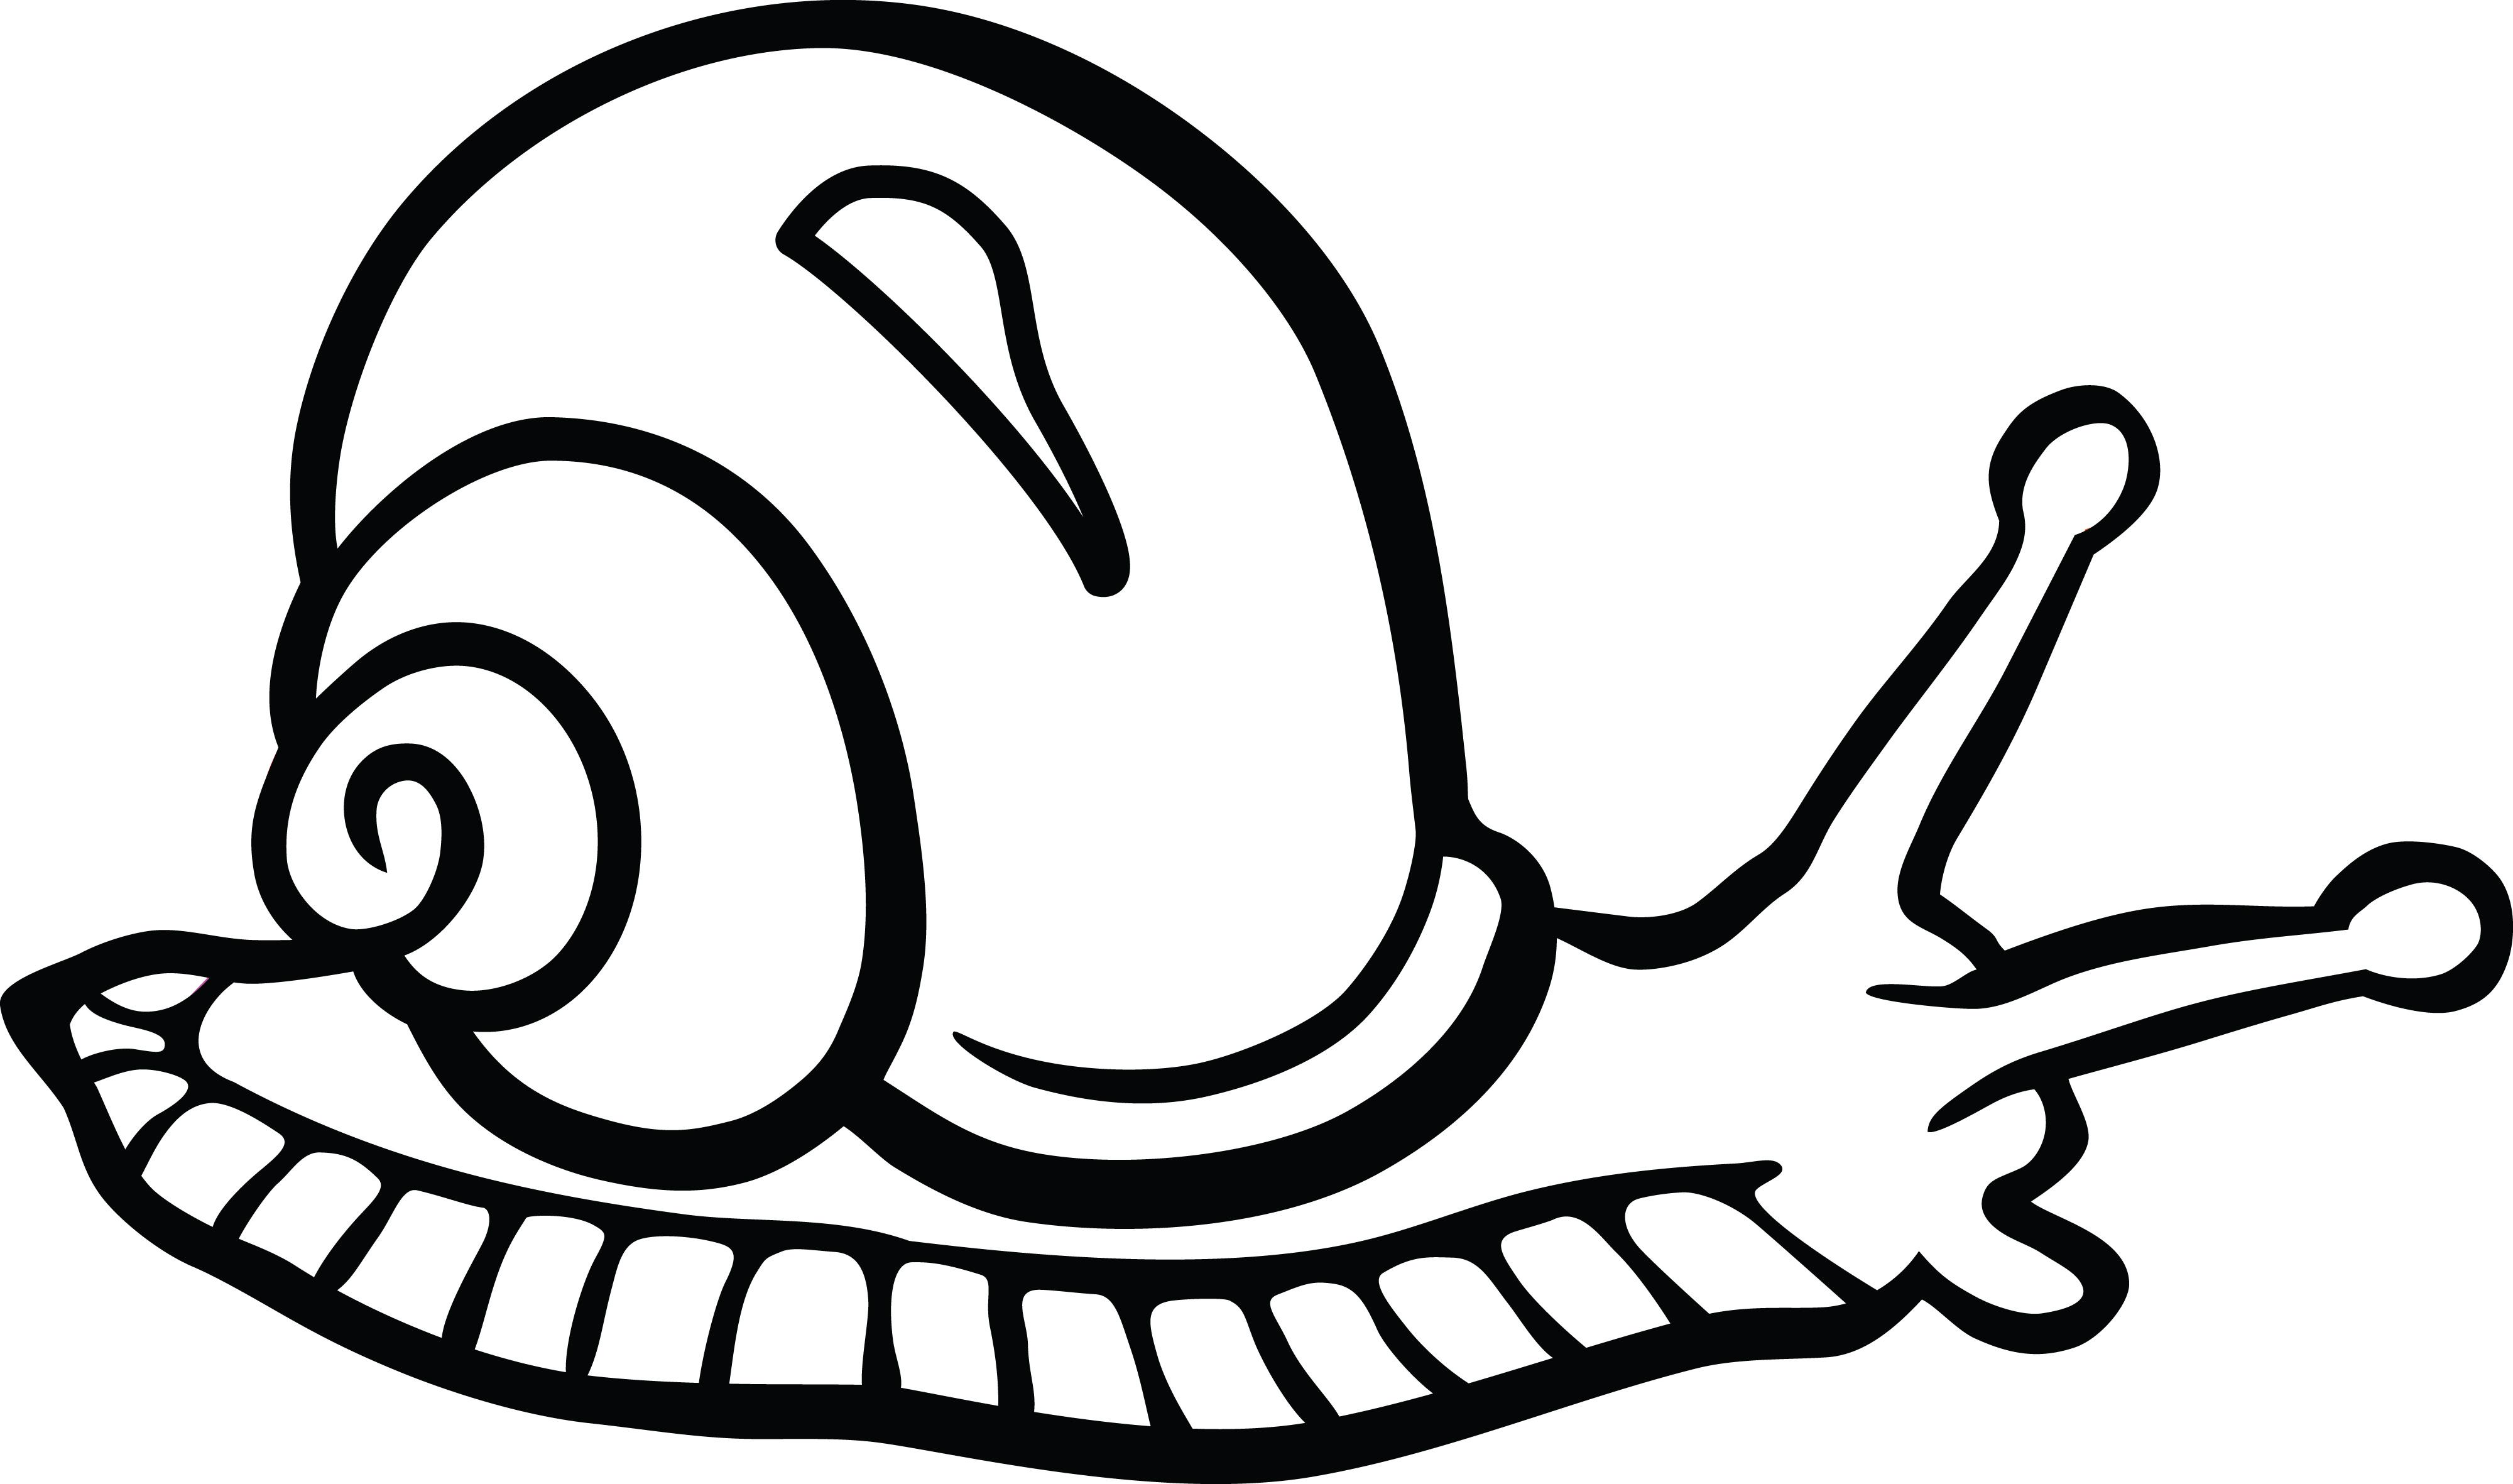 free clipart of a snail rh free clipartof com free snail clipart snail clip art outline